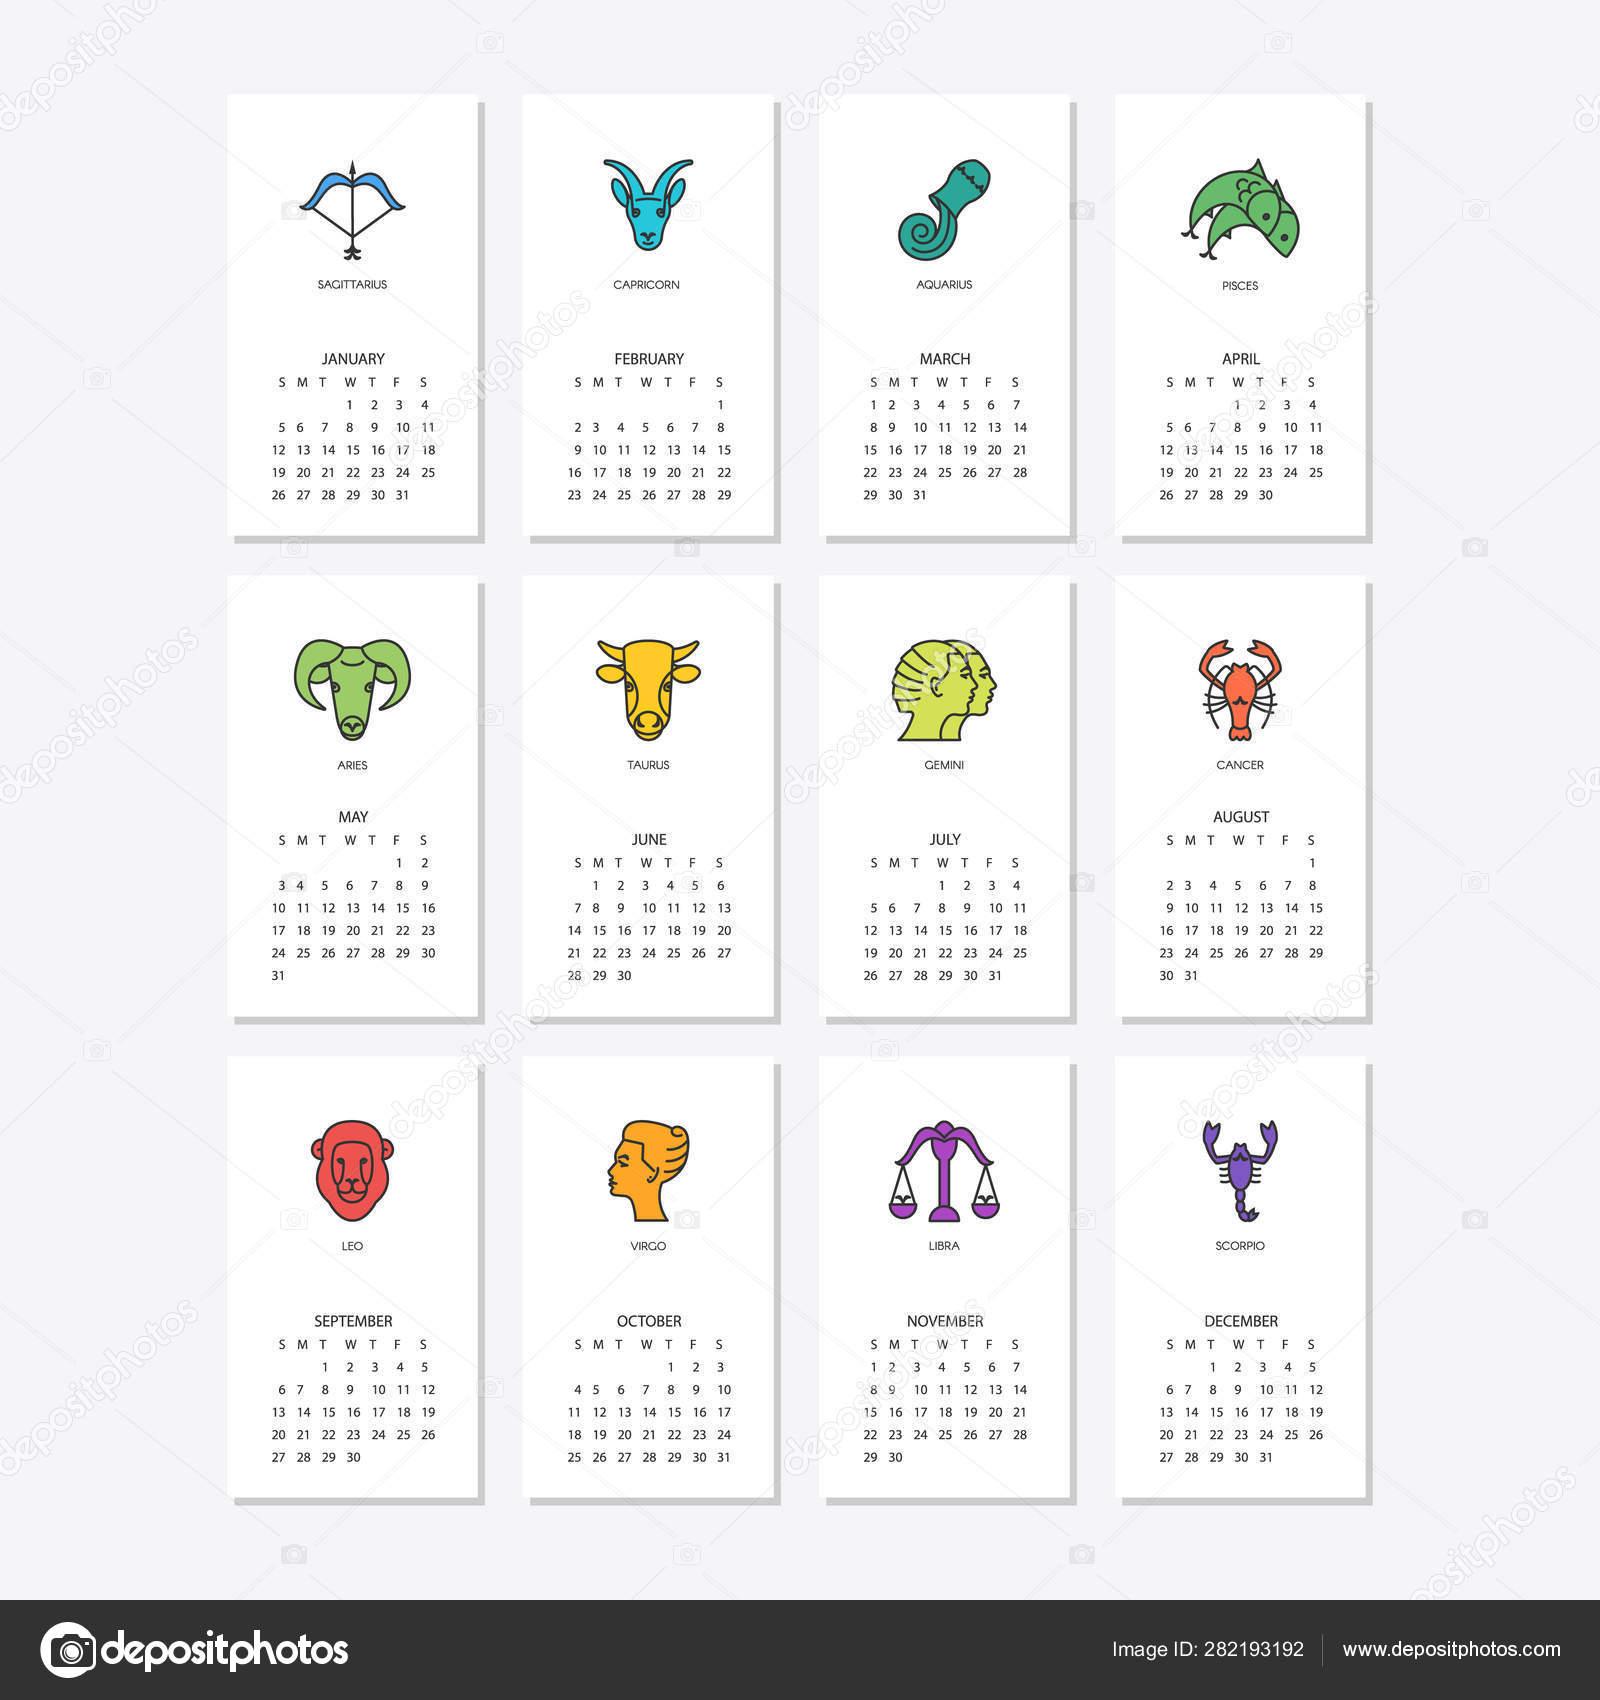 Calendar 2020 With Horoscope Signs Zodiac Symbols Set